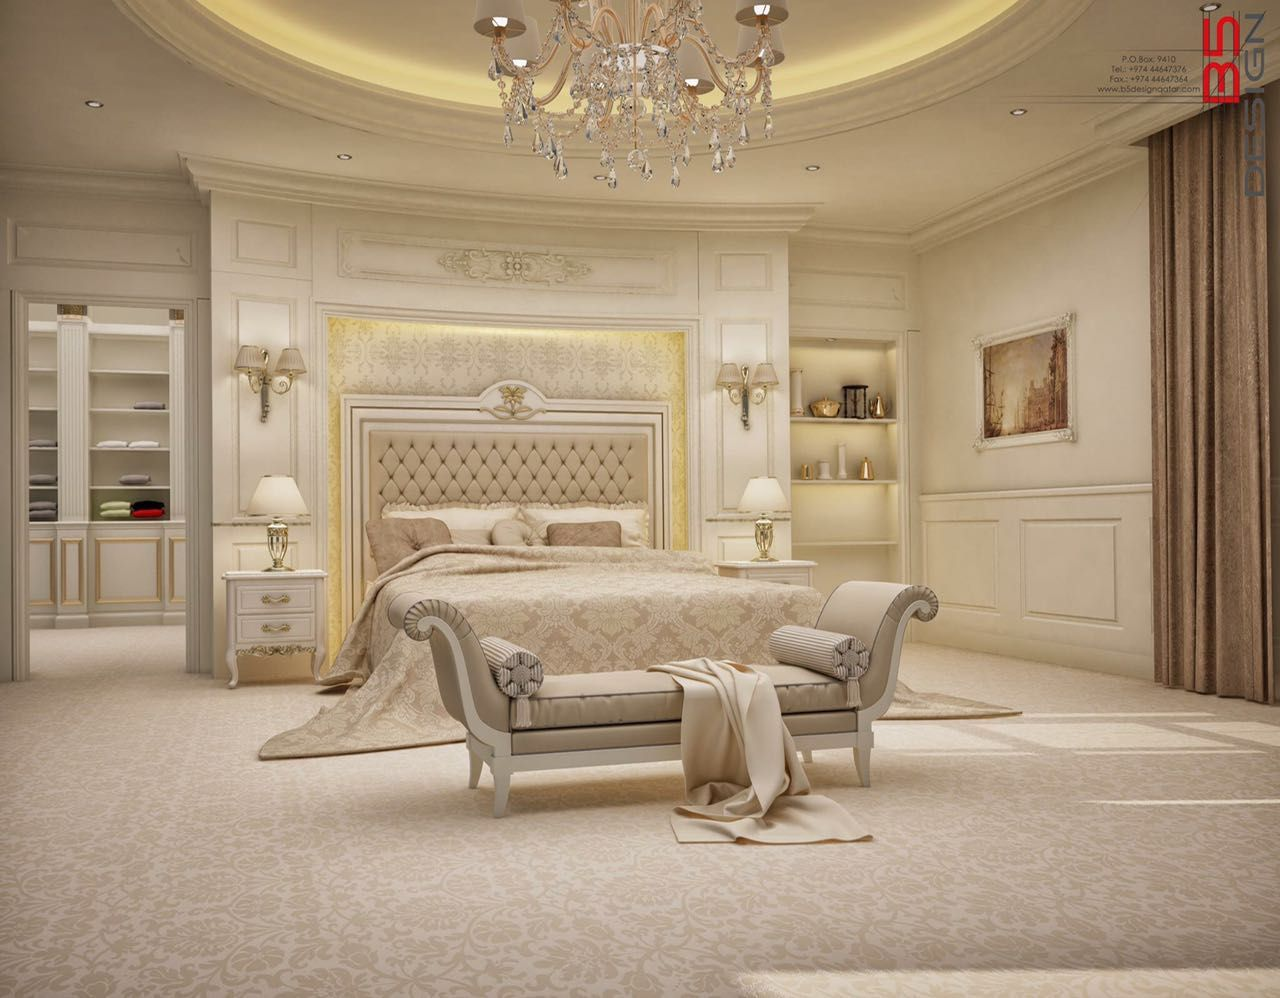 master bedroom design private villa doha qatar on dreamy luxurious master bedroom designs and decor ideas id=37891